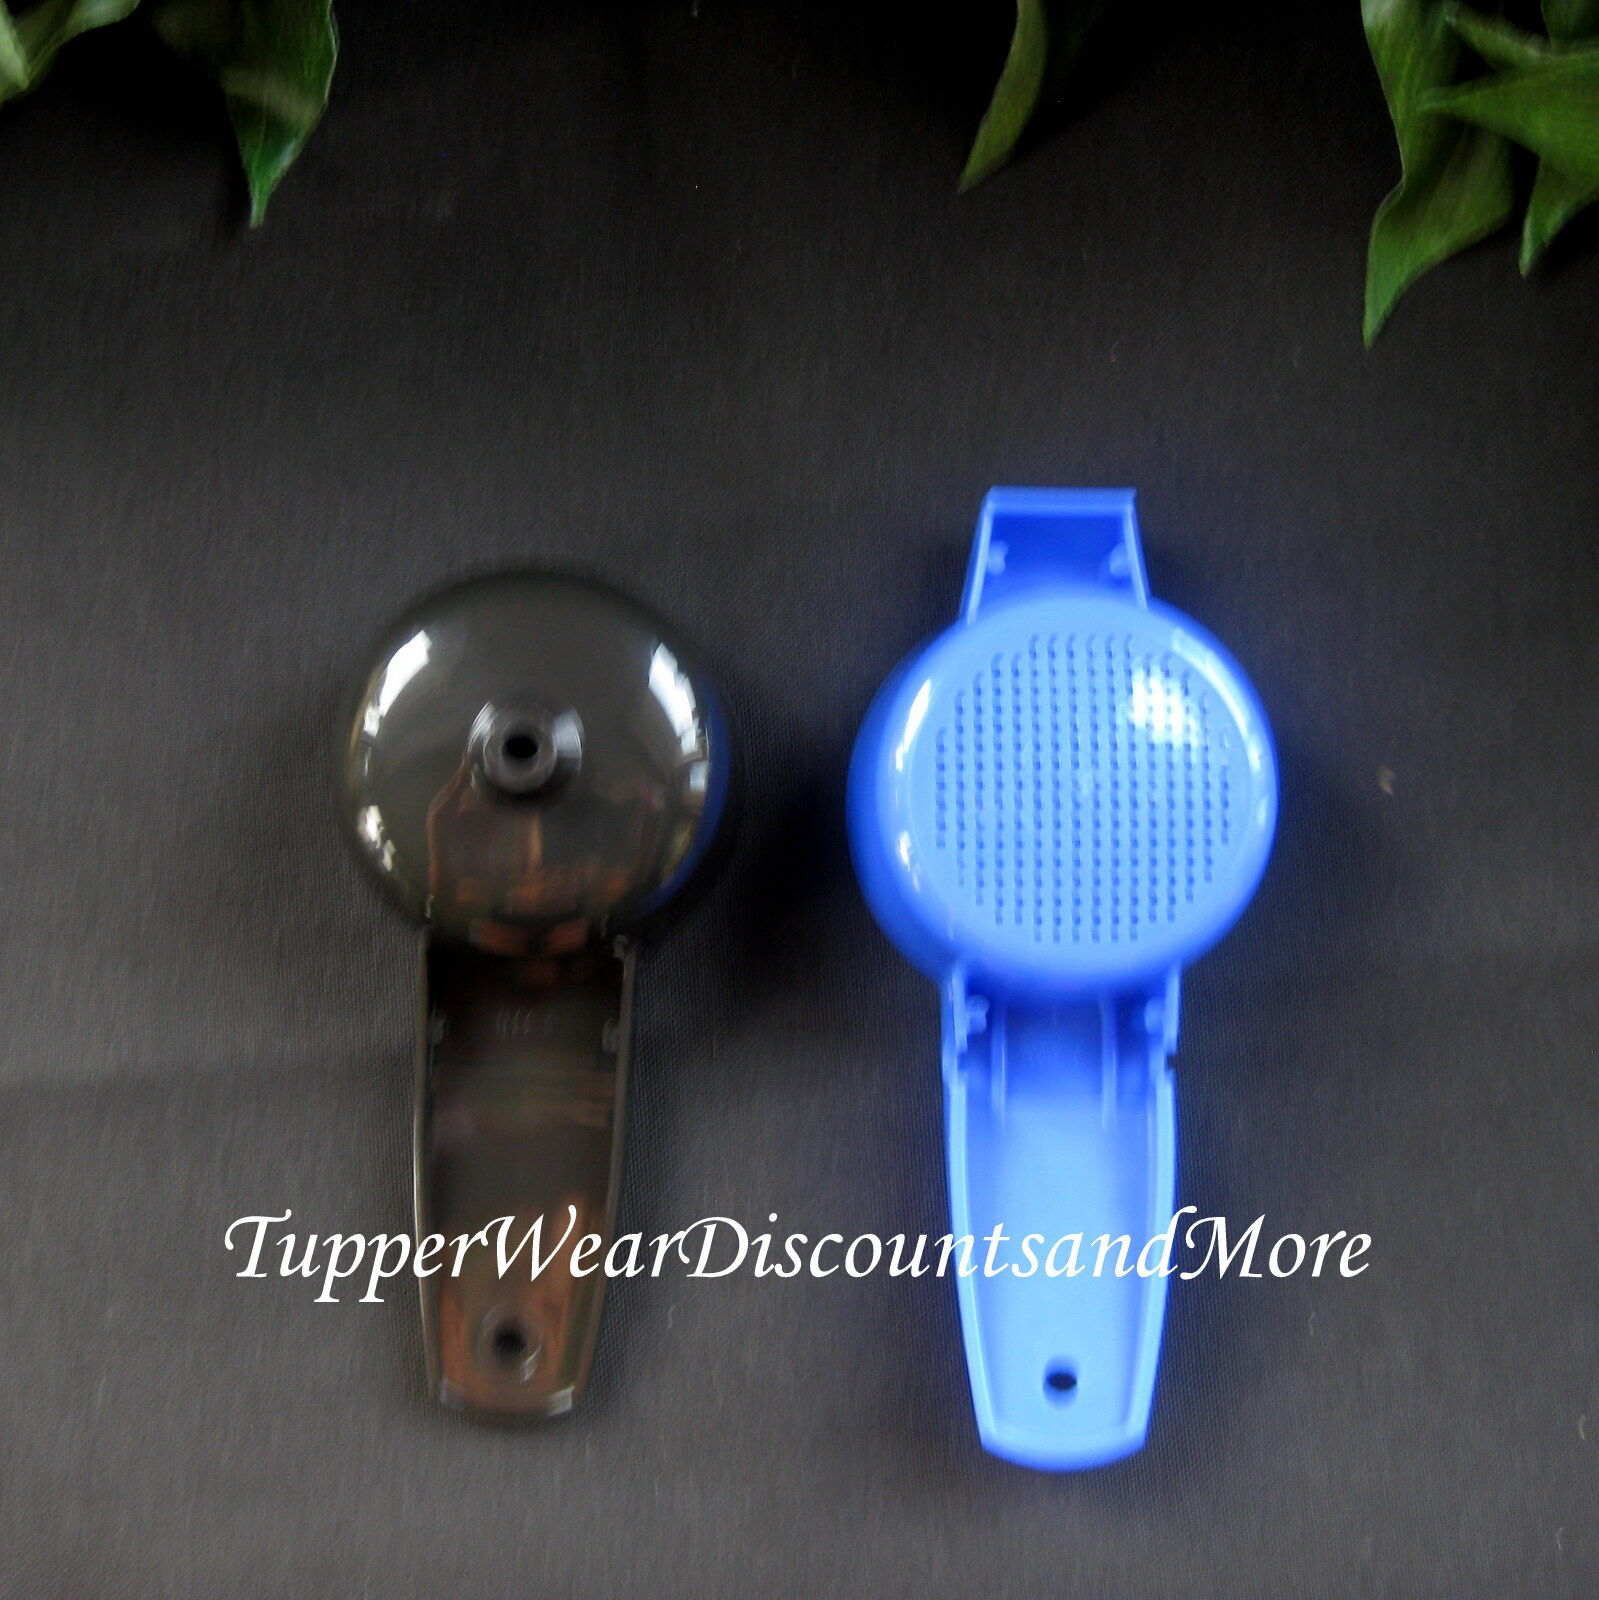 Tupperware Mini Blue Sifter & Black Funnel Set Kitchen Gadget Free Ship